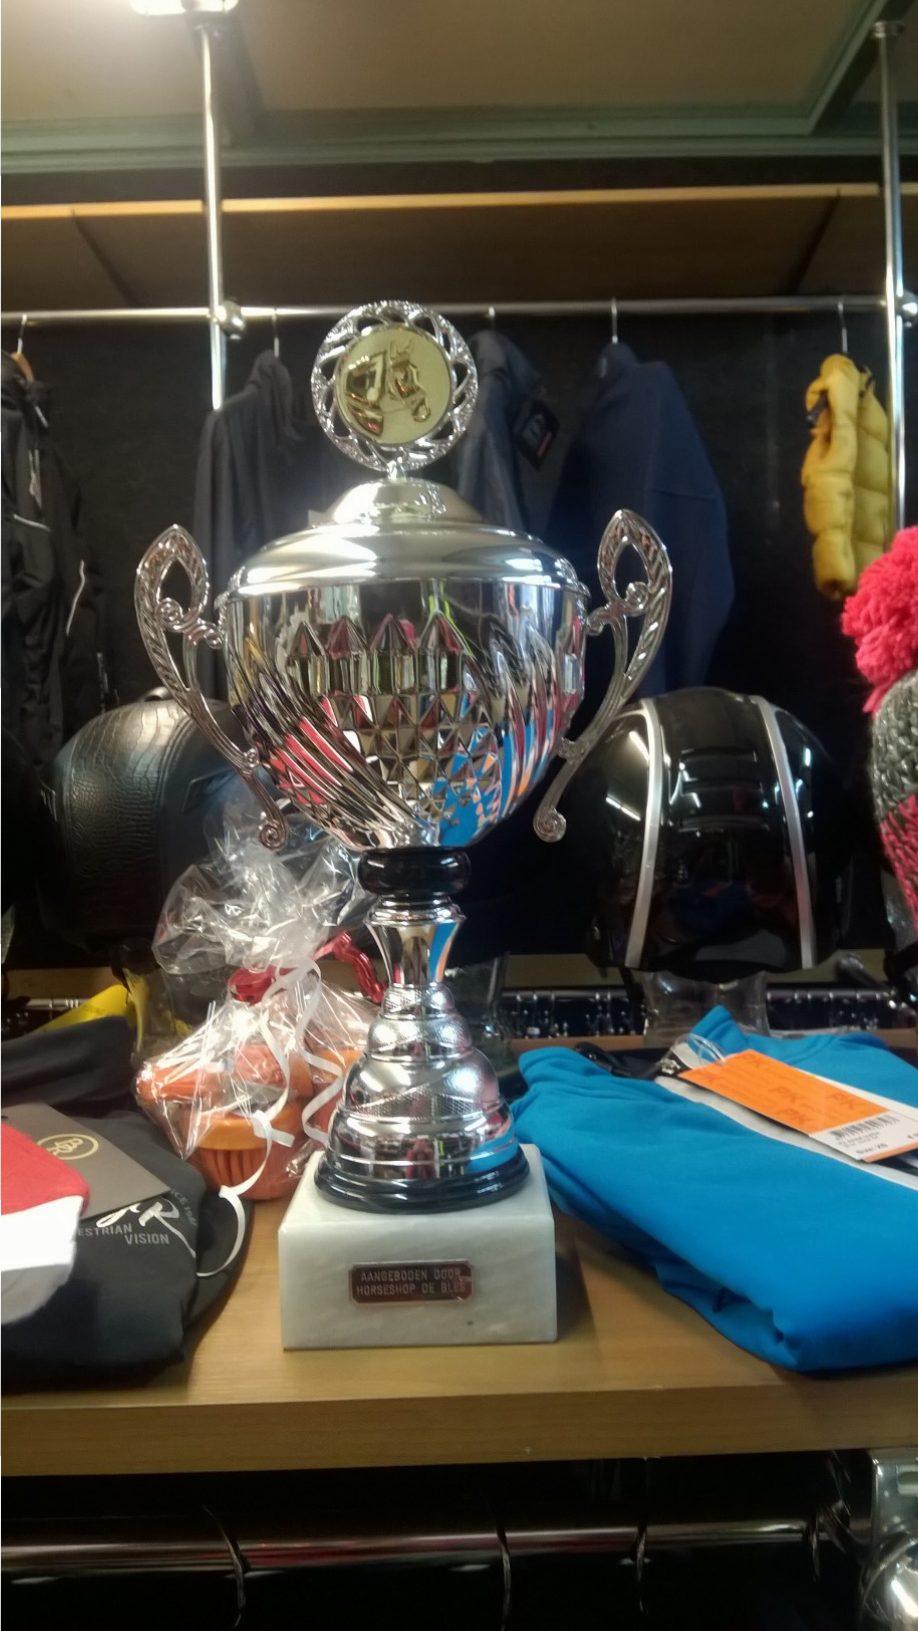 Ida Hoving en Esmee Kramp winnen de Bles-competitie